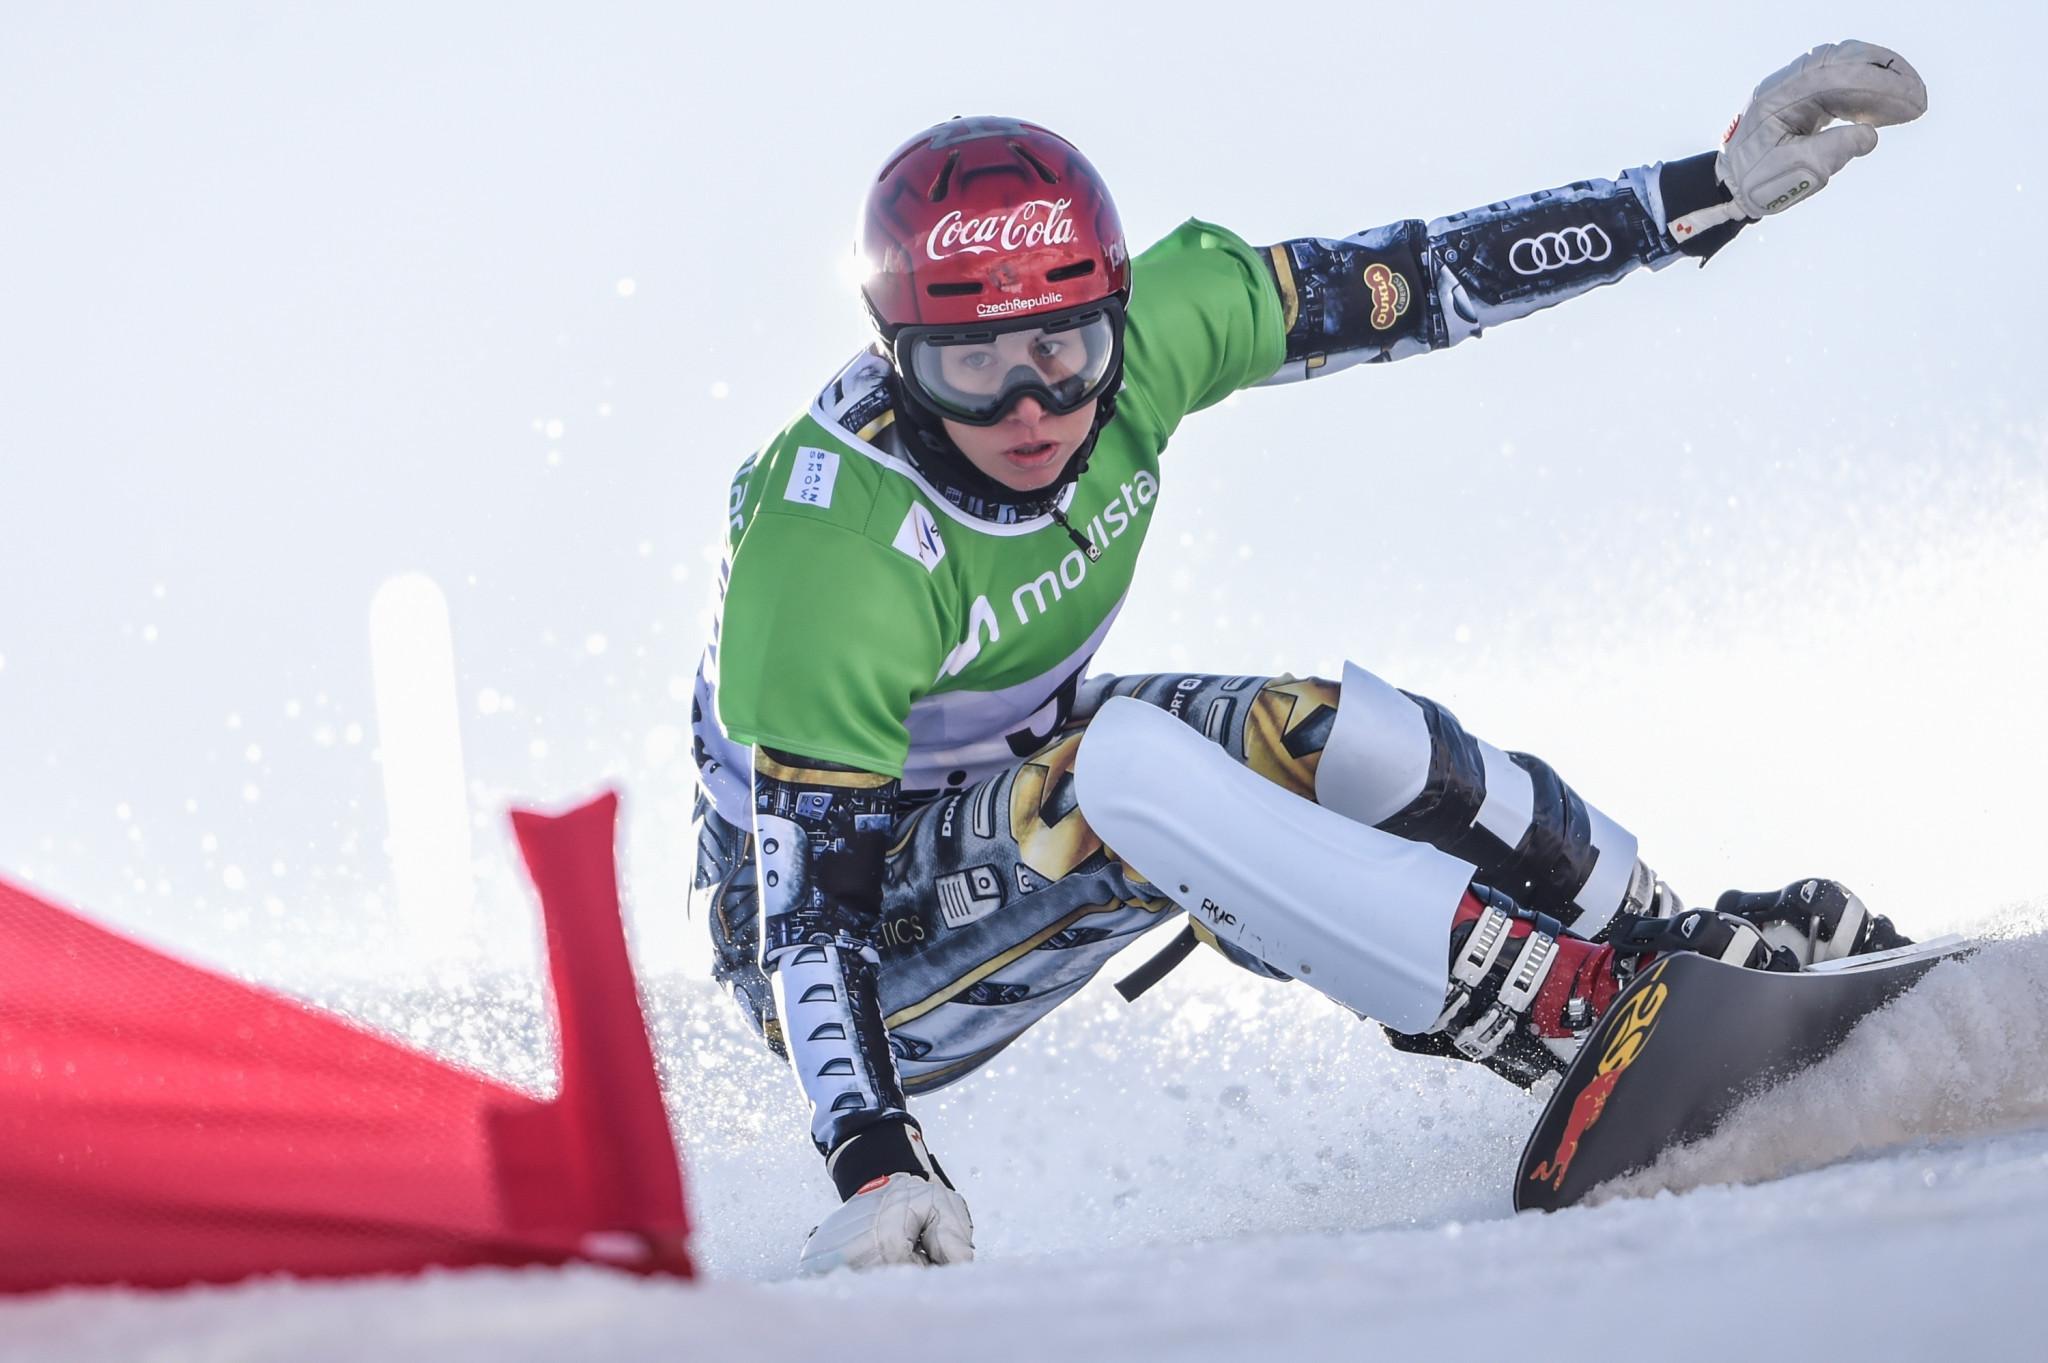 Ledecká and Sobolev triumph at FIS Alpine Snowboard World Cup season opener